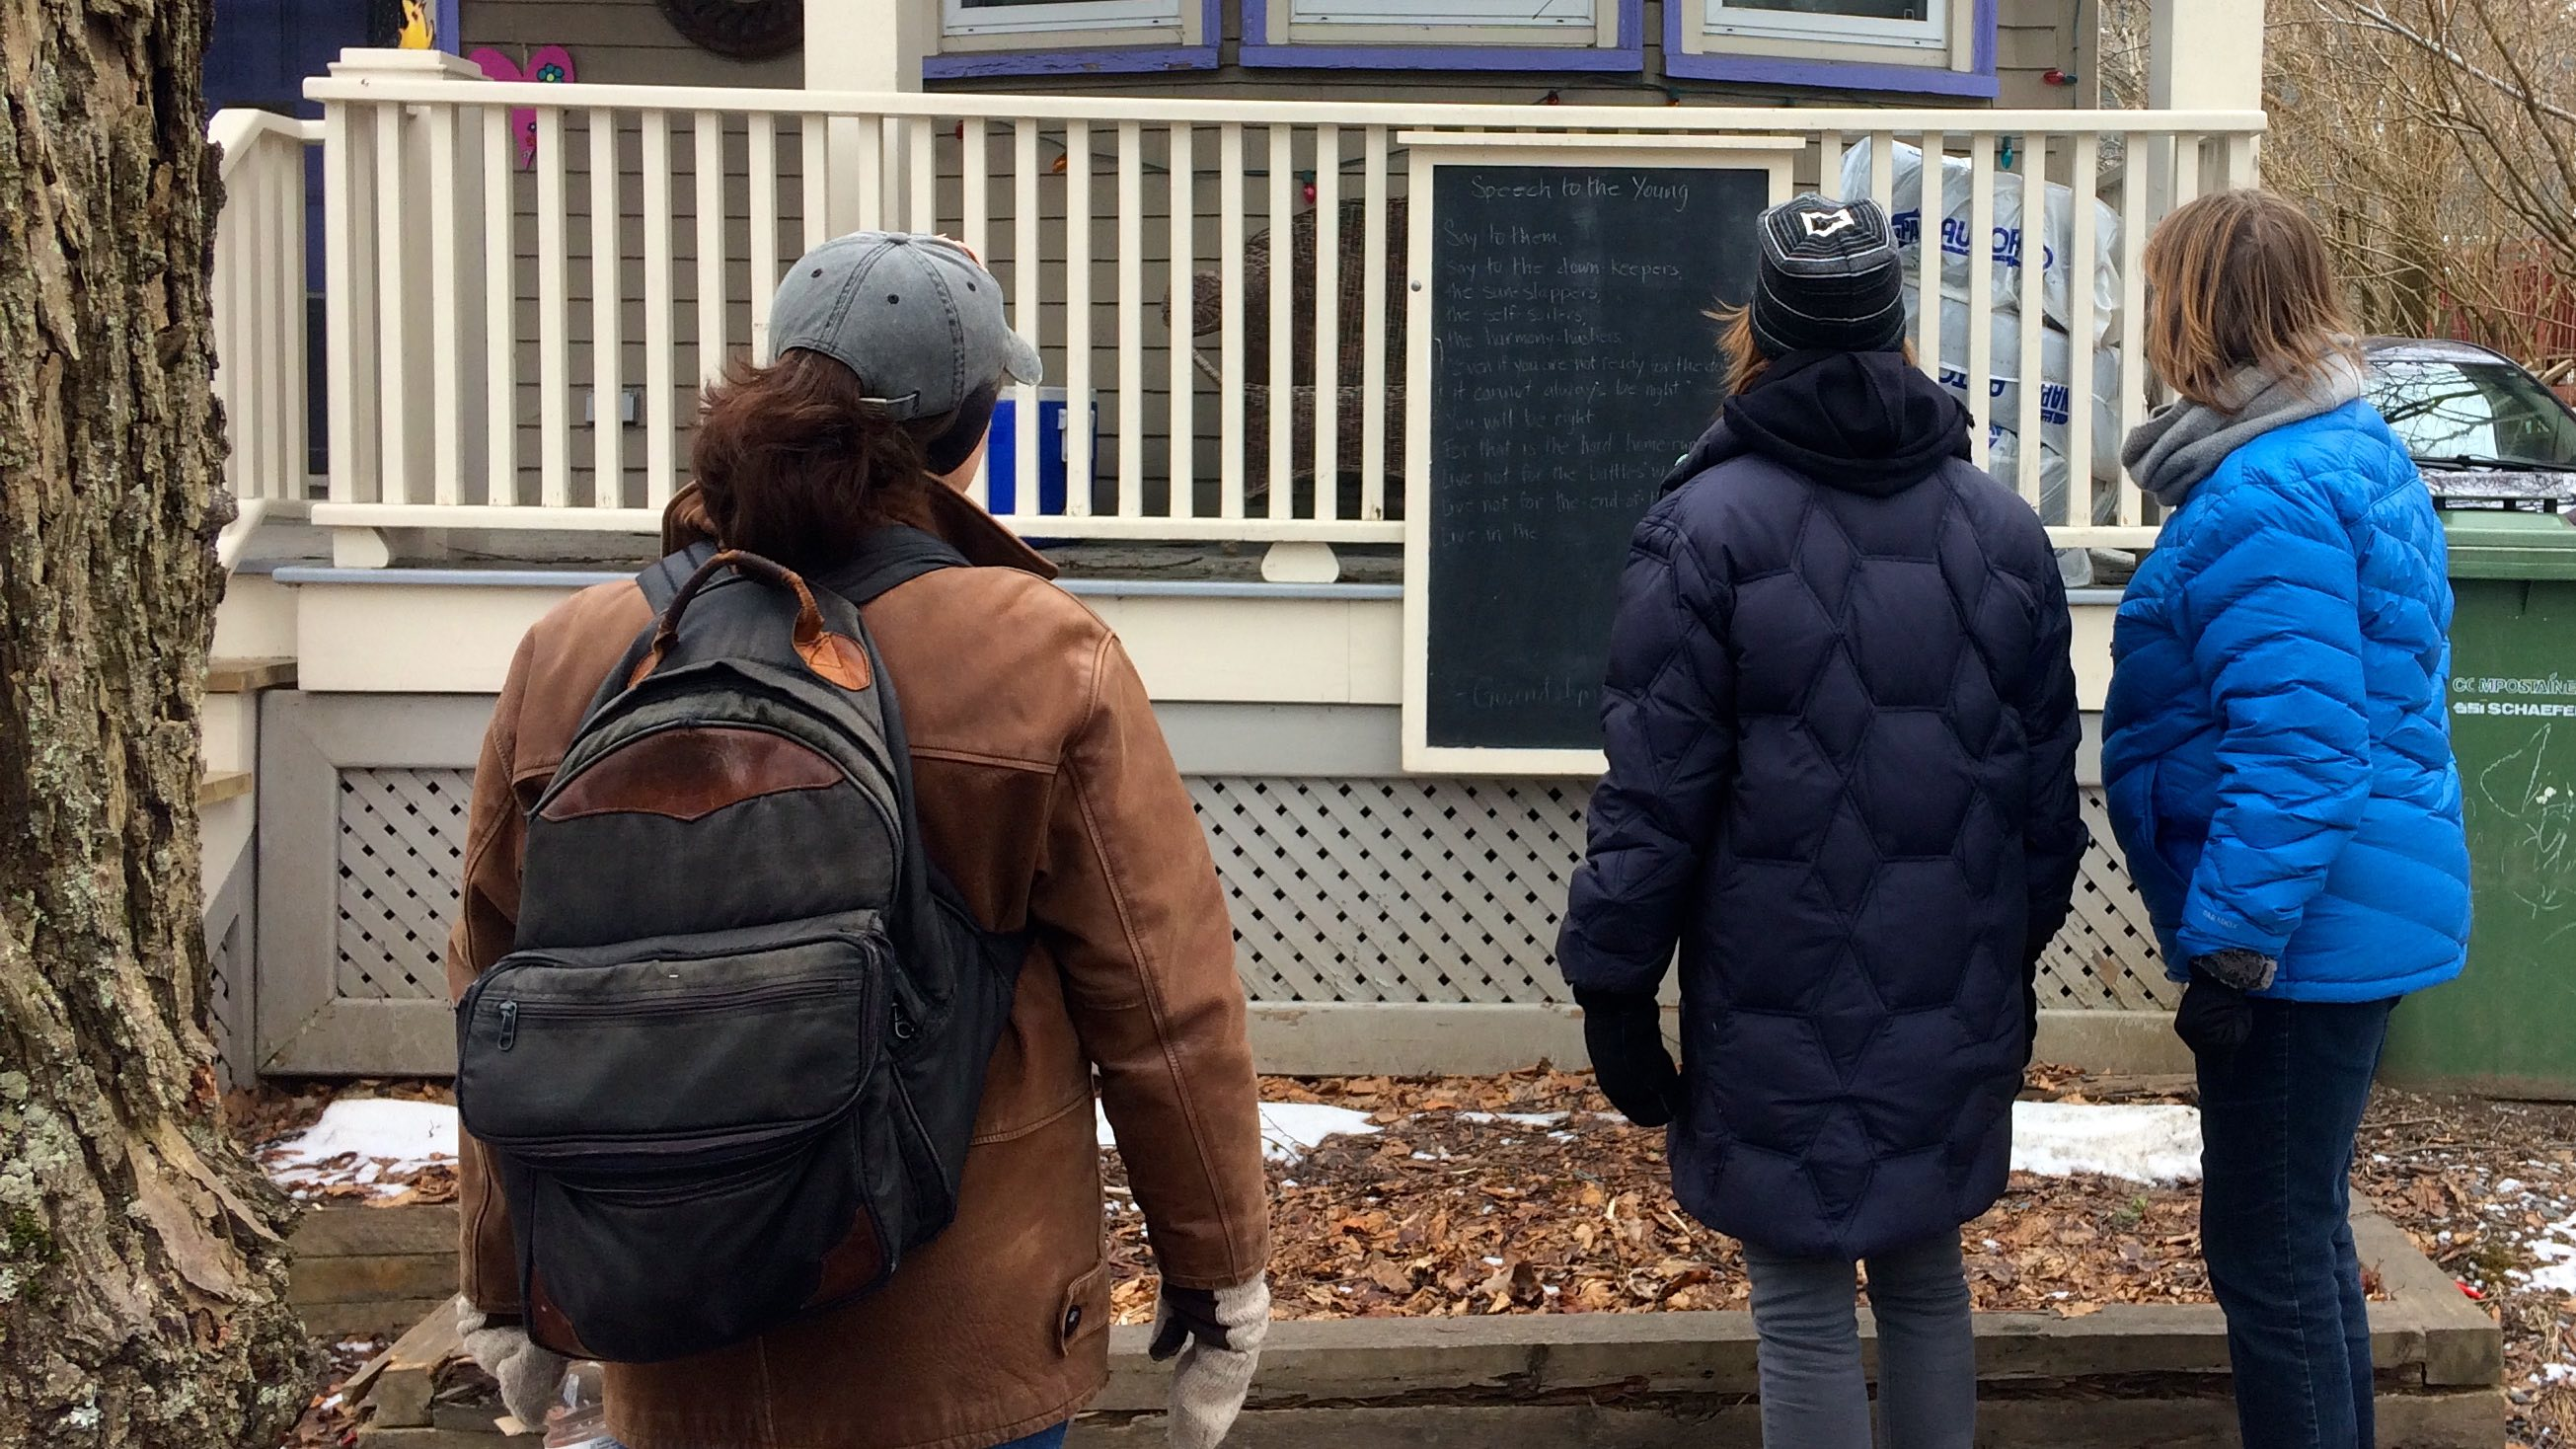 Lisa Johnson (left, with backpack) reads a poem on Harvard Street.